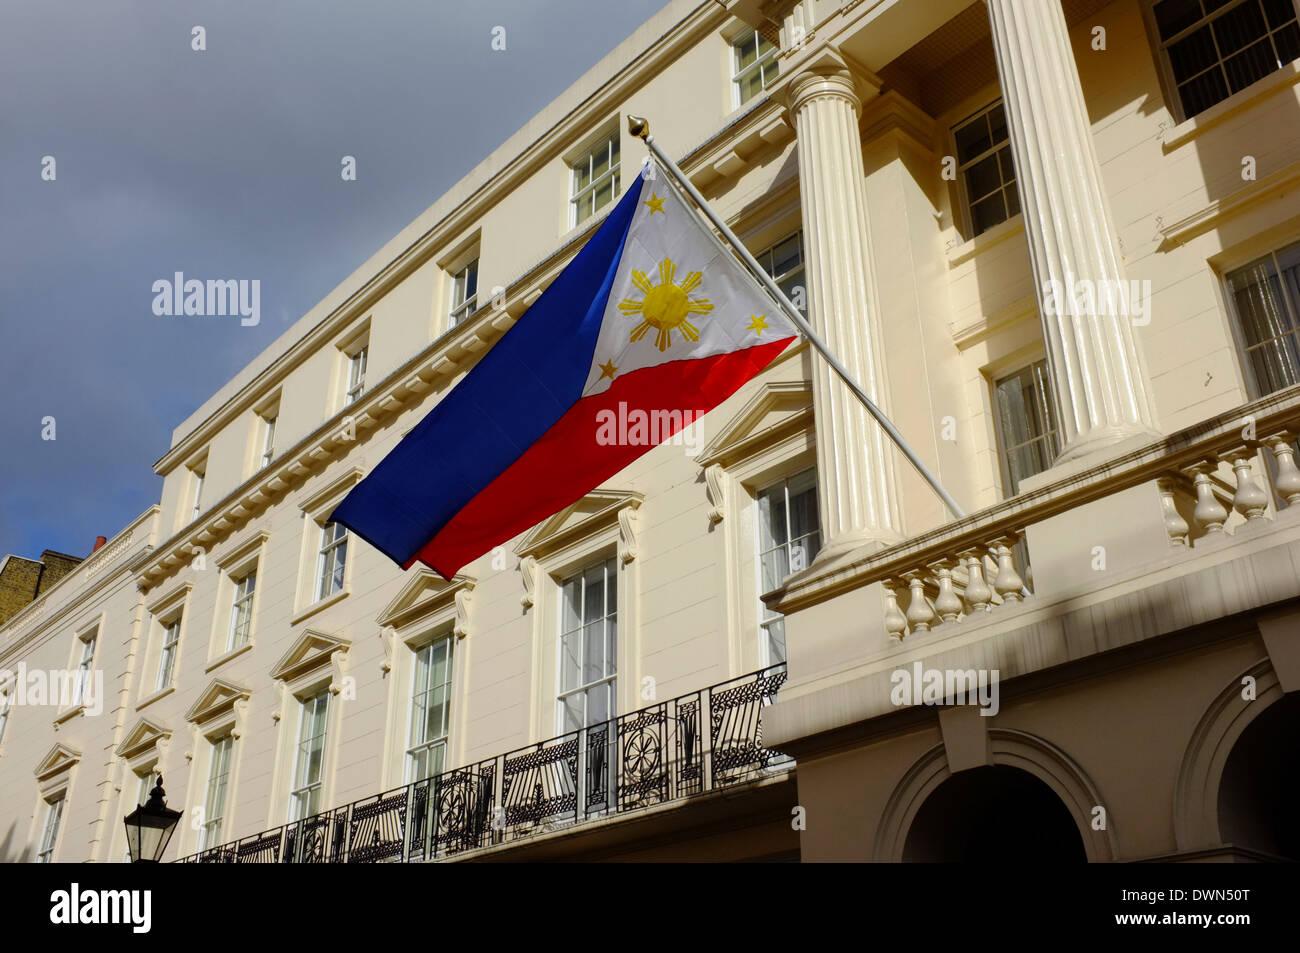 Great Philippines Embassy On Suffolk Street, London, UK